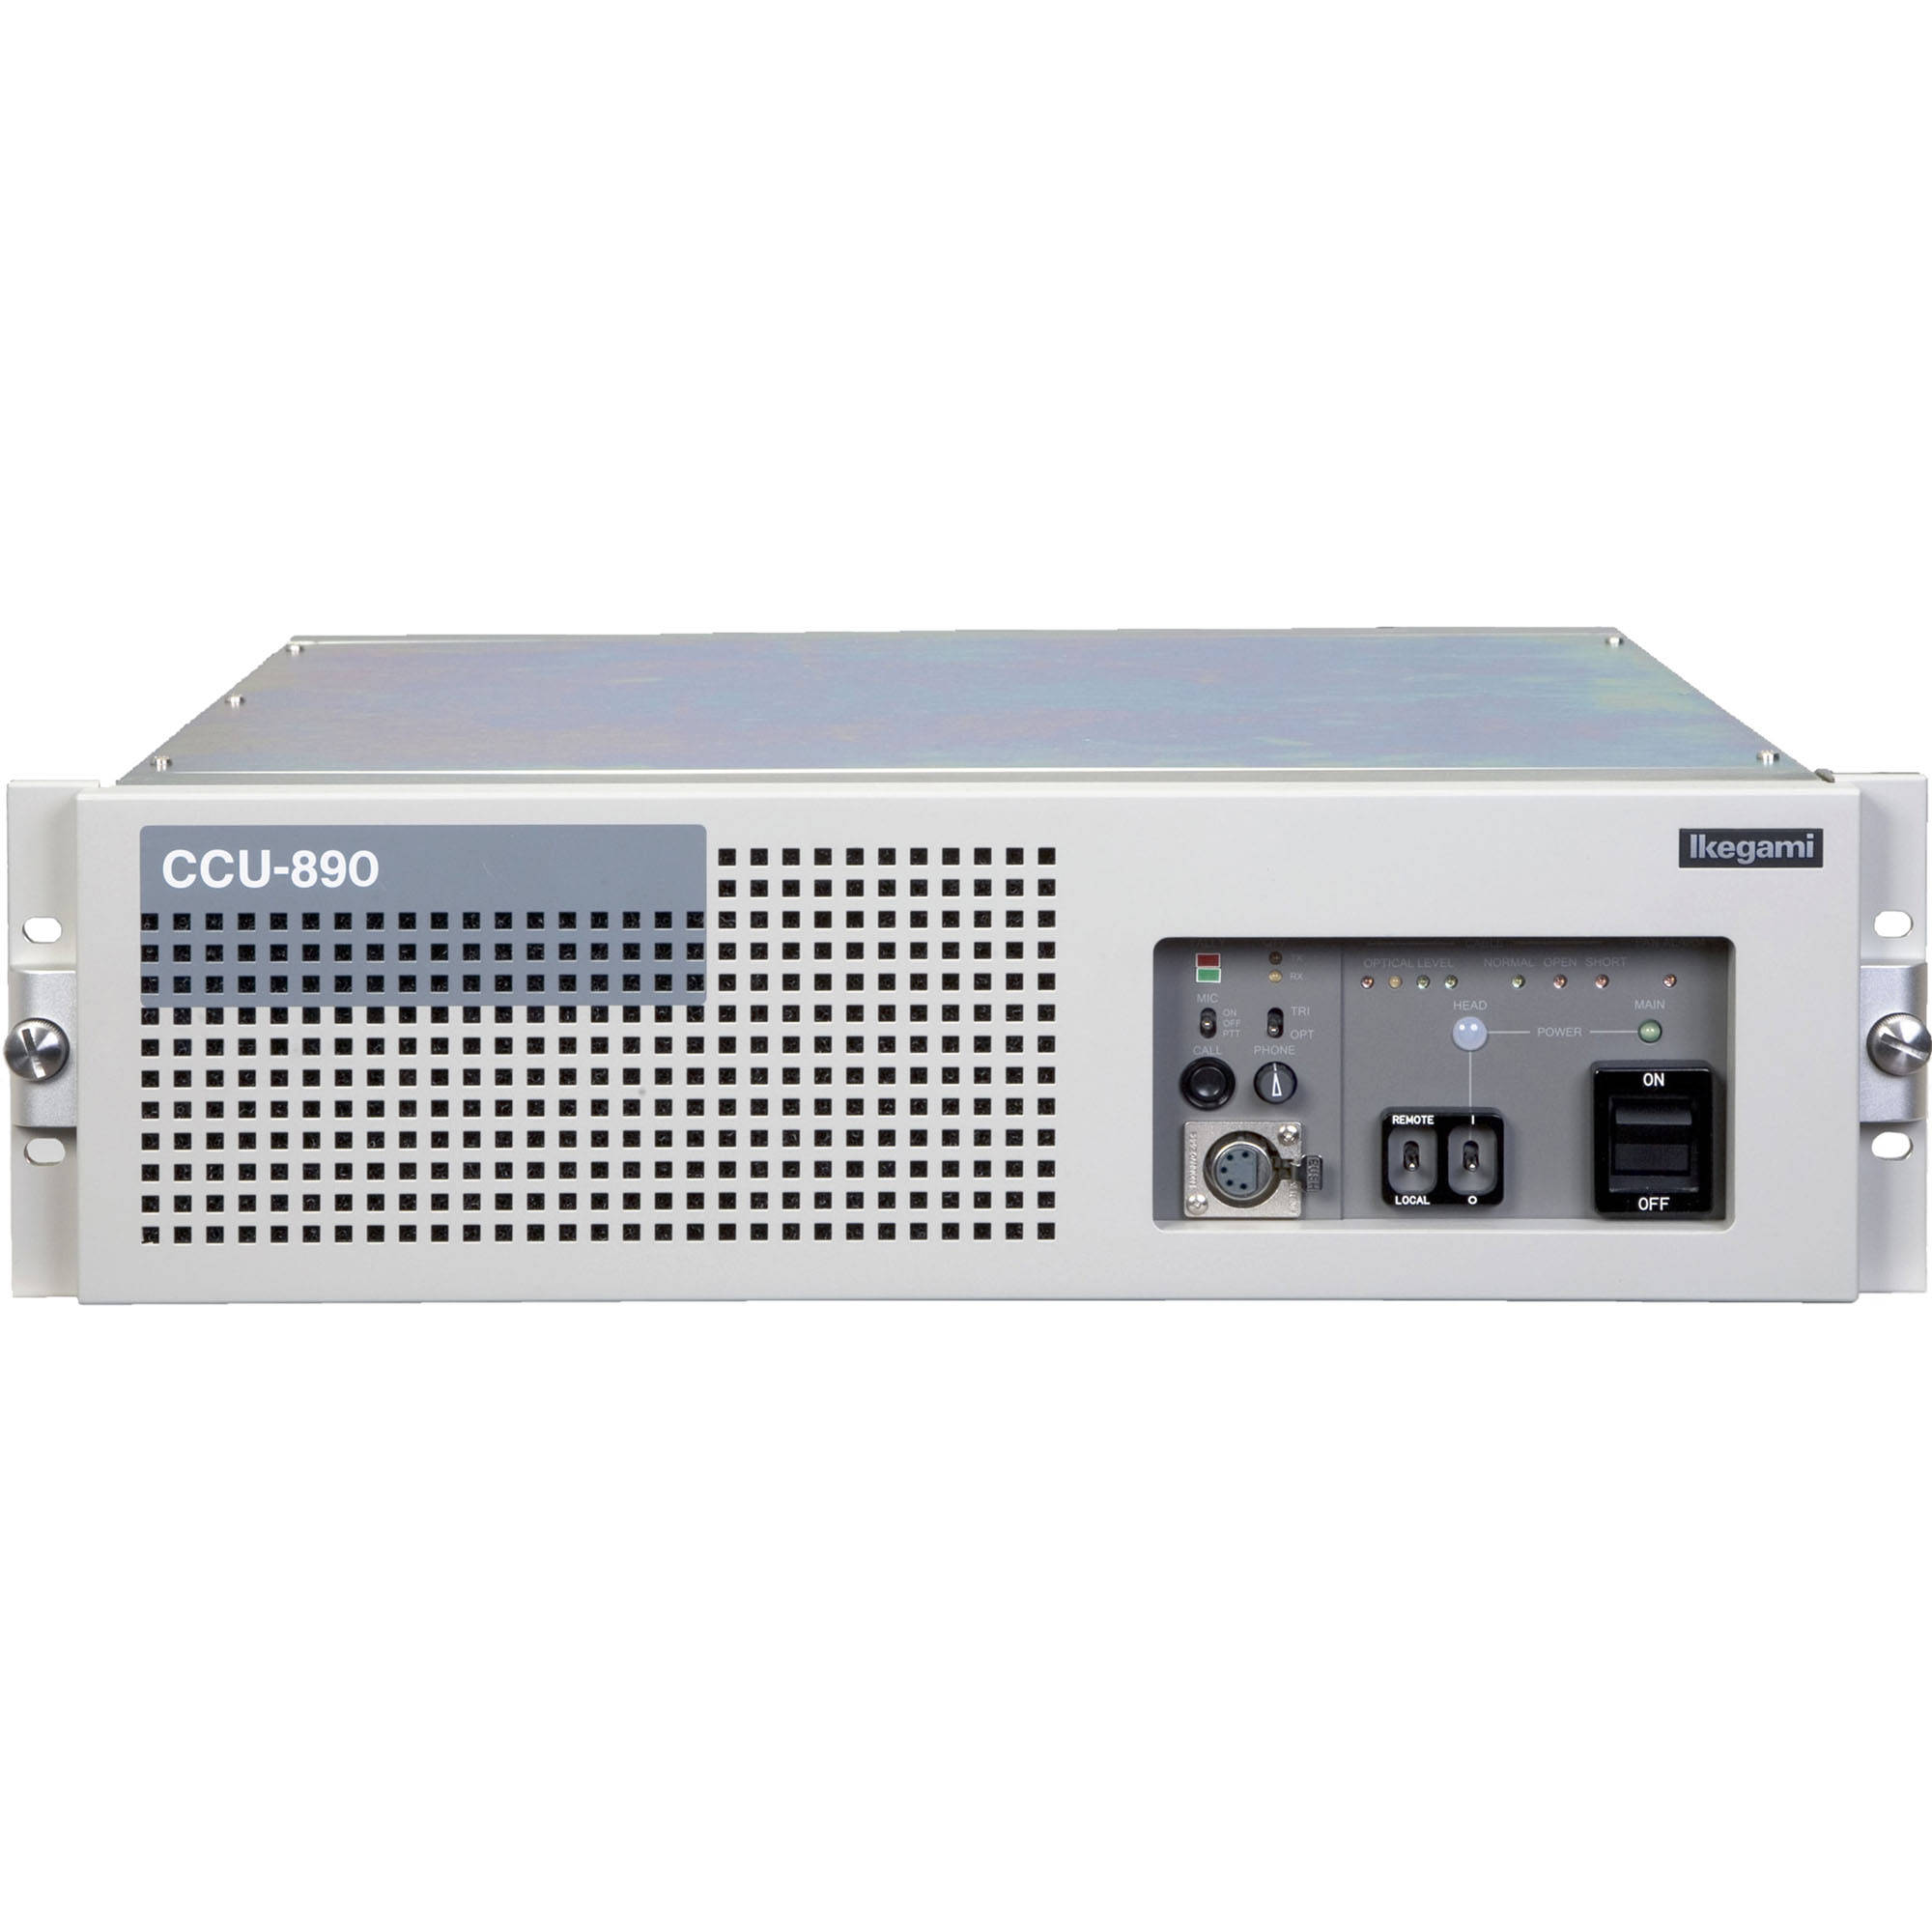 Ikegami High Definition Camera Control Unit Ccu 890 Bh Photo Sony Intercom Wiring Harness